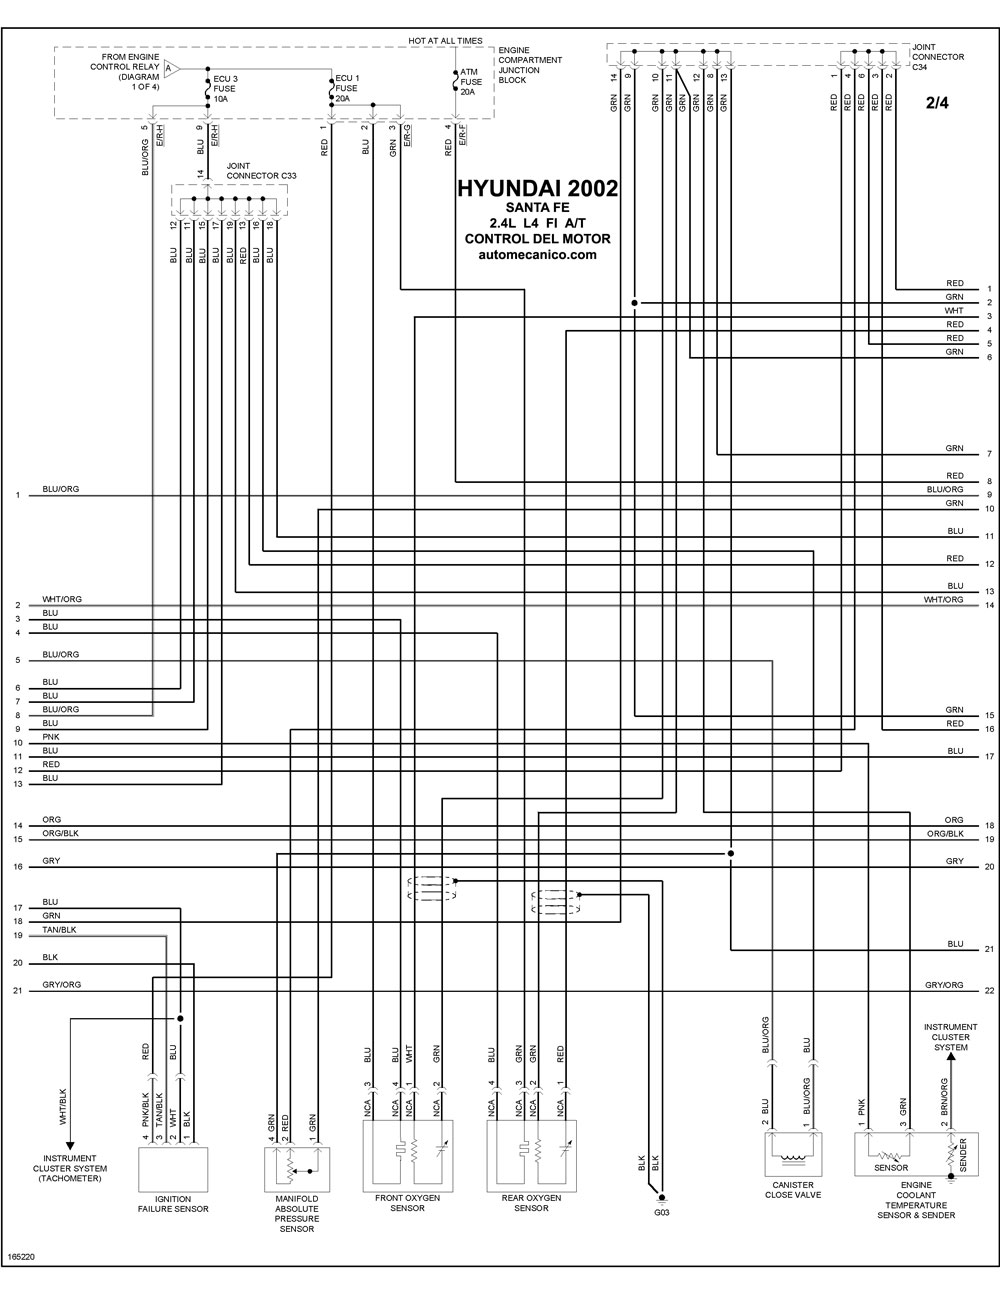 hyundai-Diagramas-Graphics-2002